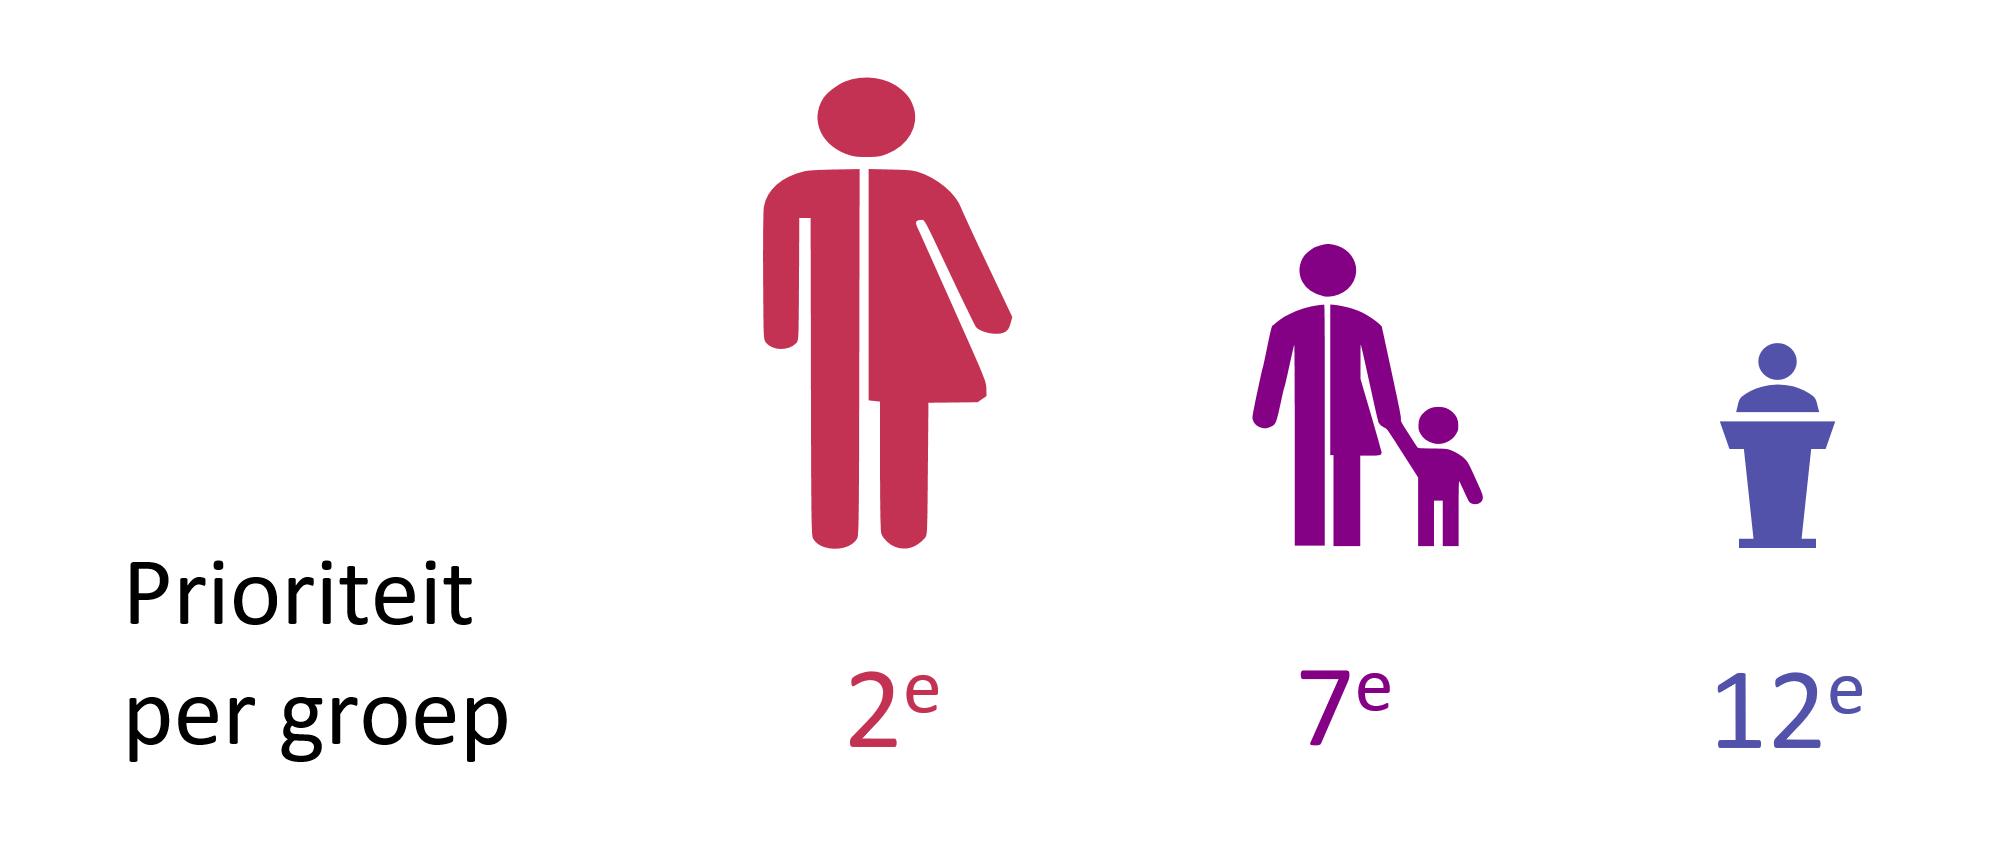 Afbeelding Prioriteit per Groep voor Thema Beeldvorming en Inclusie